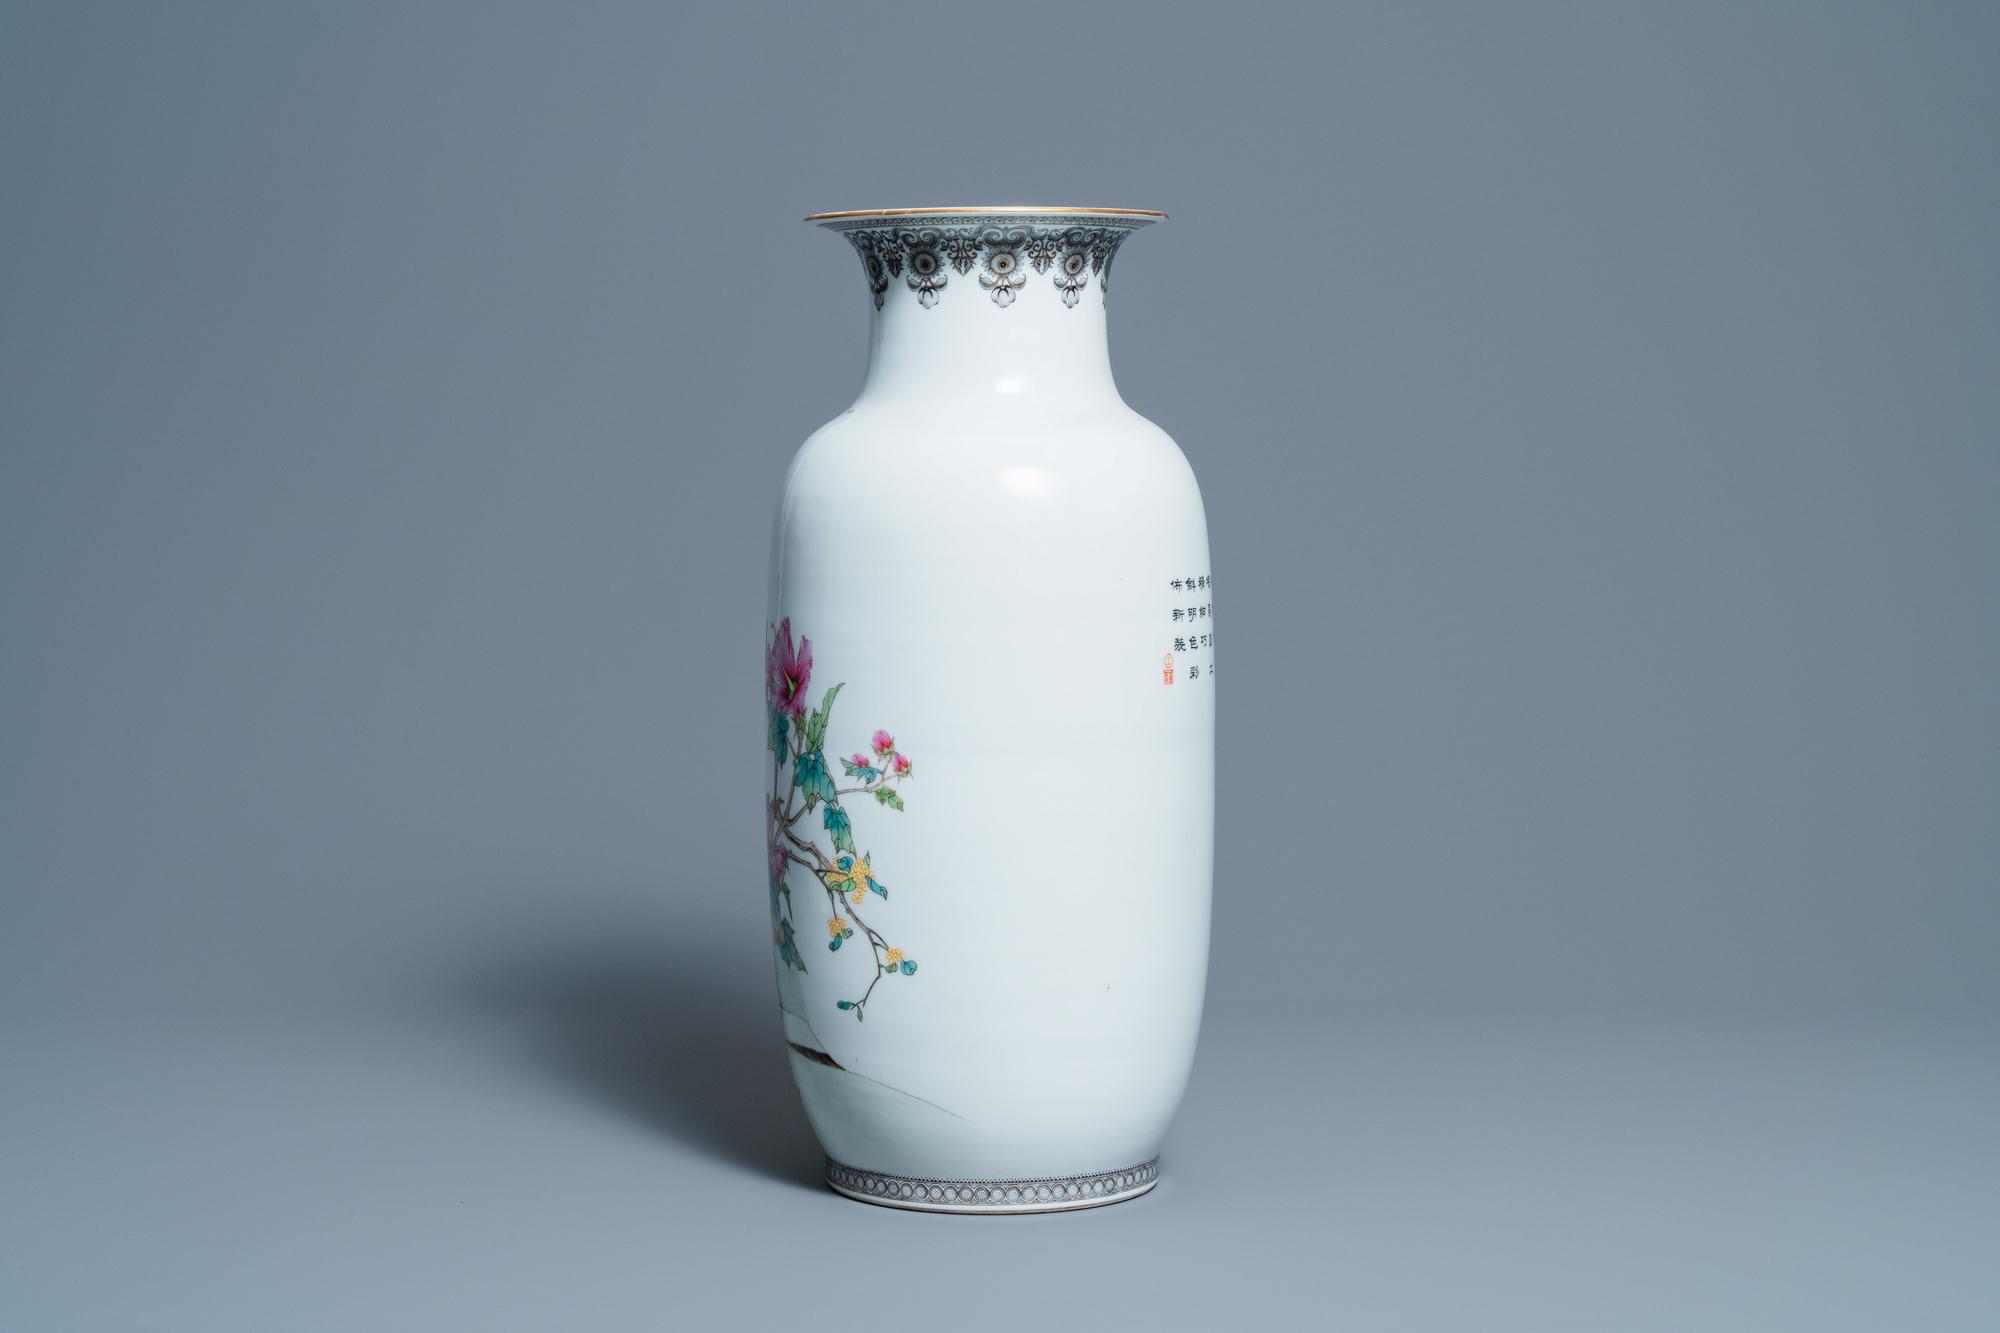 A fine Chinese famille rose vase, Zhong Guo Jingdezhen Zhi mark, Republic - Image 2 of 6